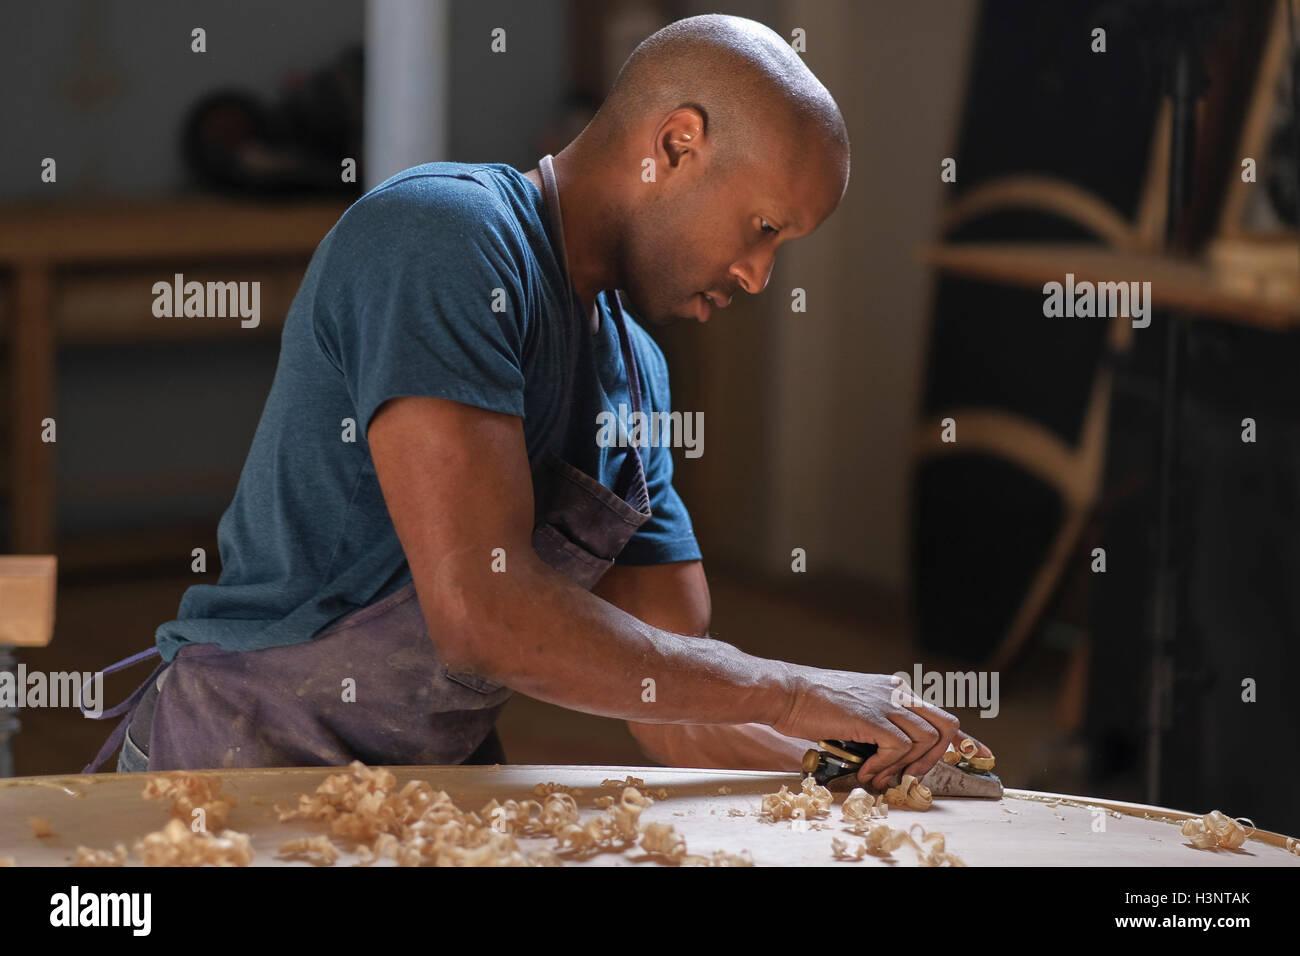 Craftsman making paddleboard in workshop - Stock Image